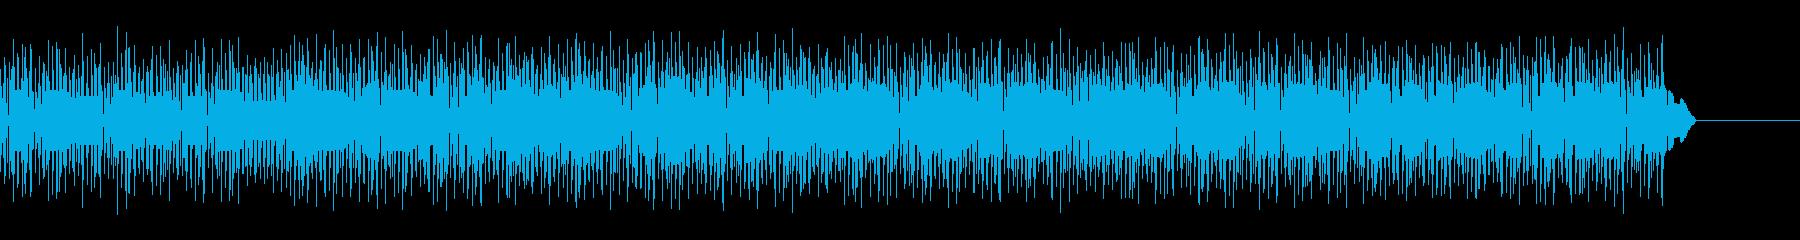 8bitピコピコサウンドで軽快なブルースの再生済みの波形